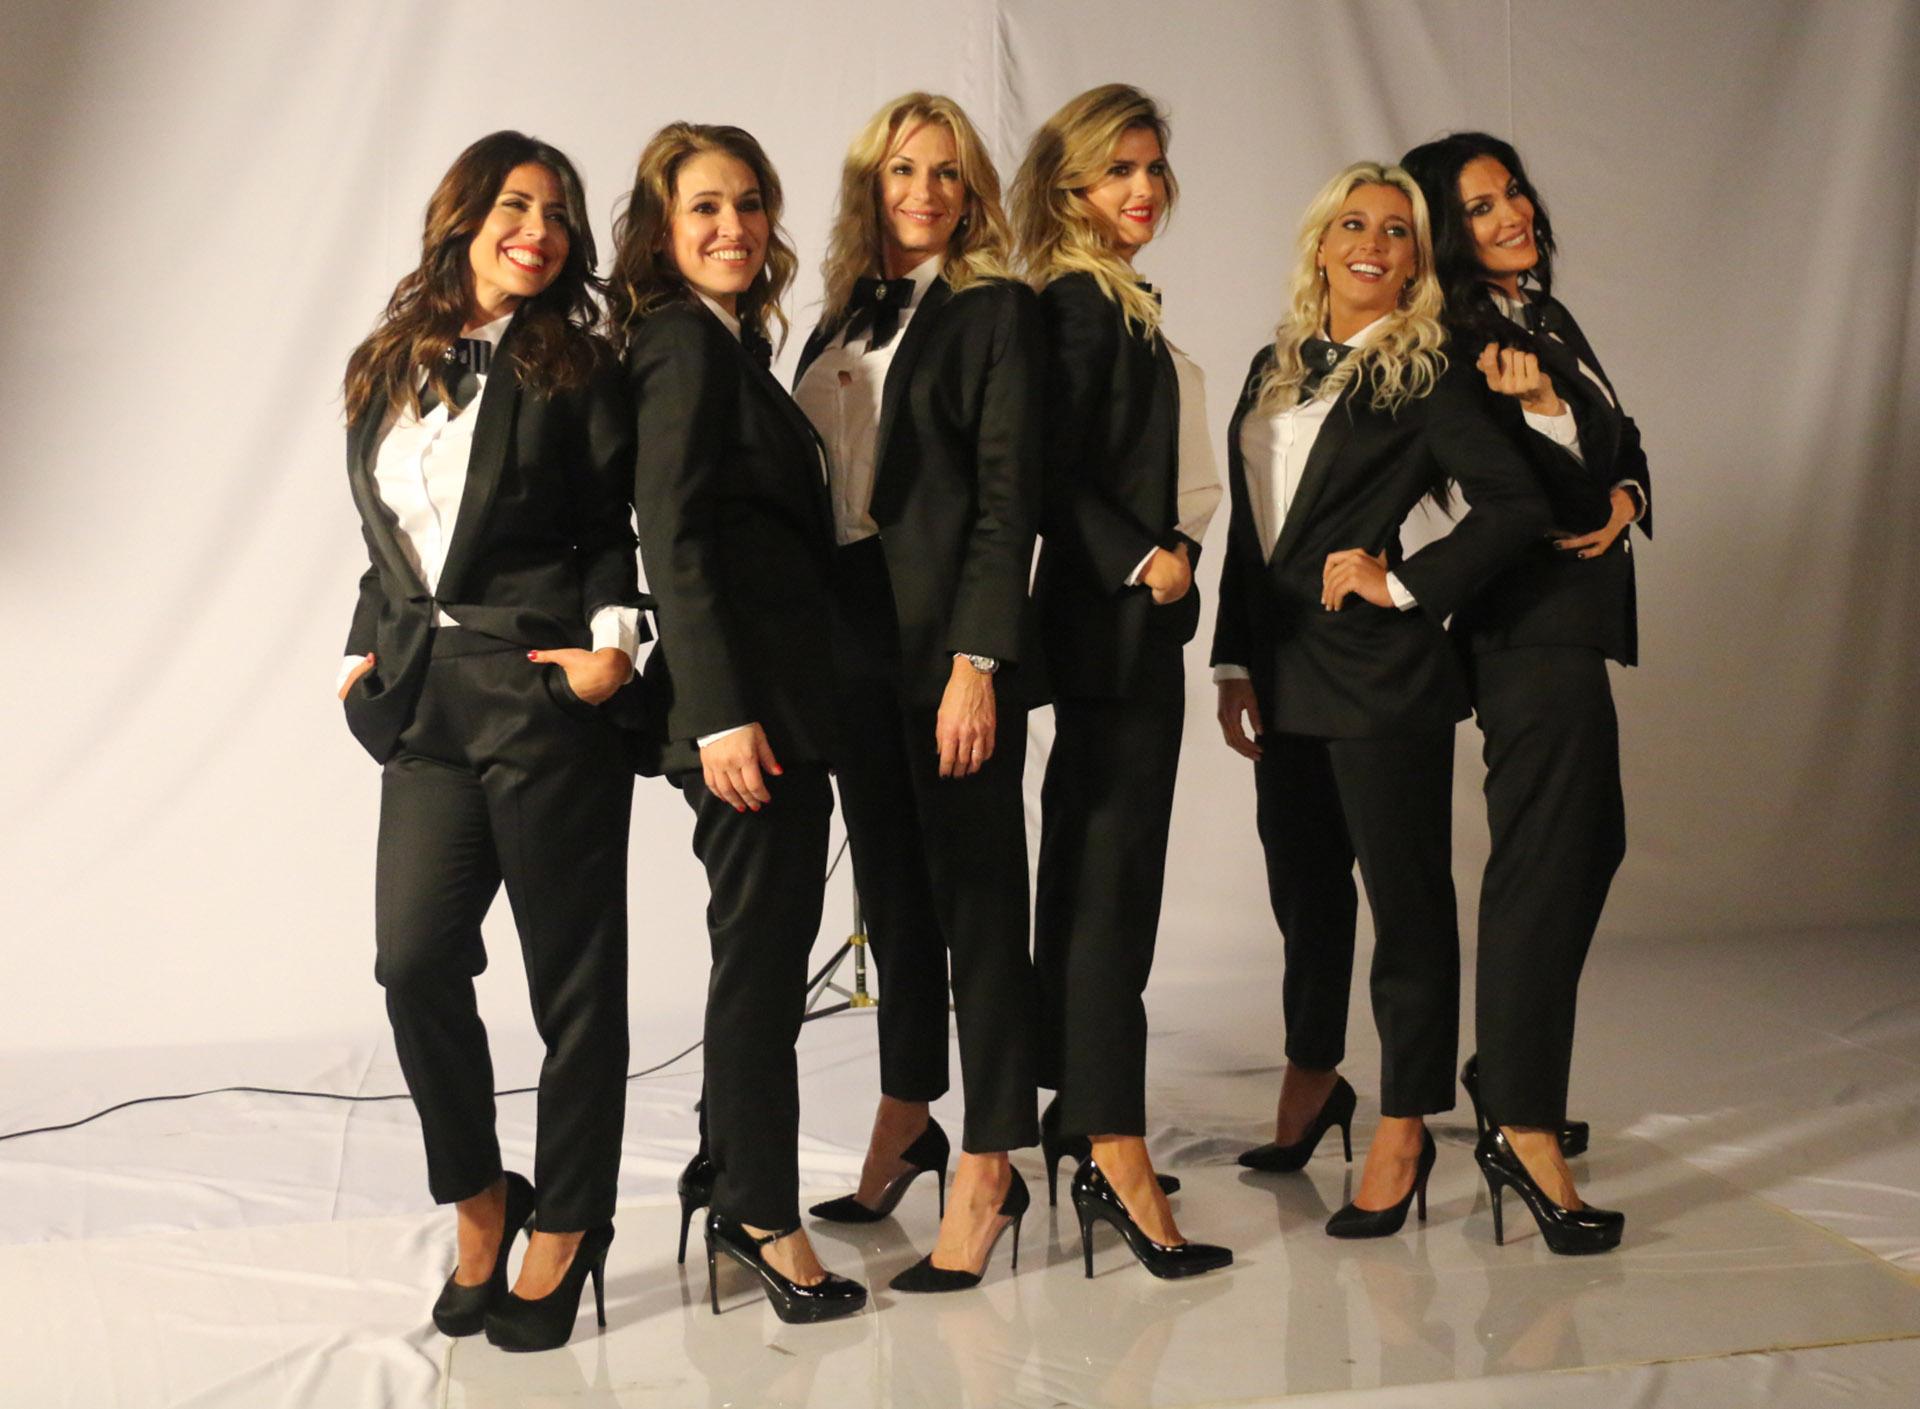 Majo Martínez, Fernanda Iglesias, Yanina Latorre, Mery del Cerro, Sol Pérez y Silvina Escudero